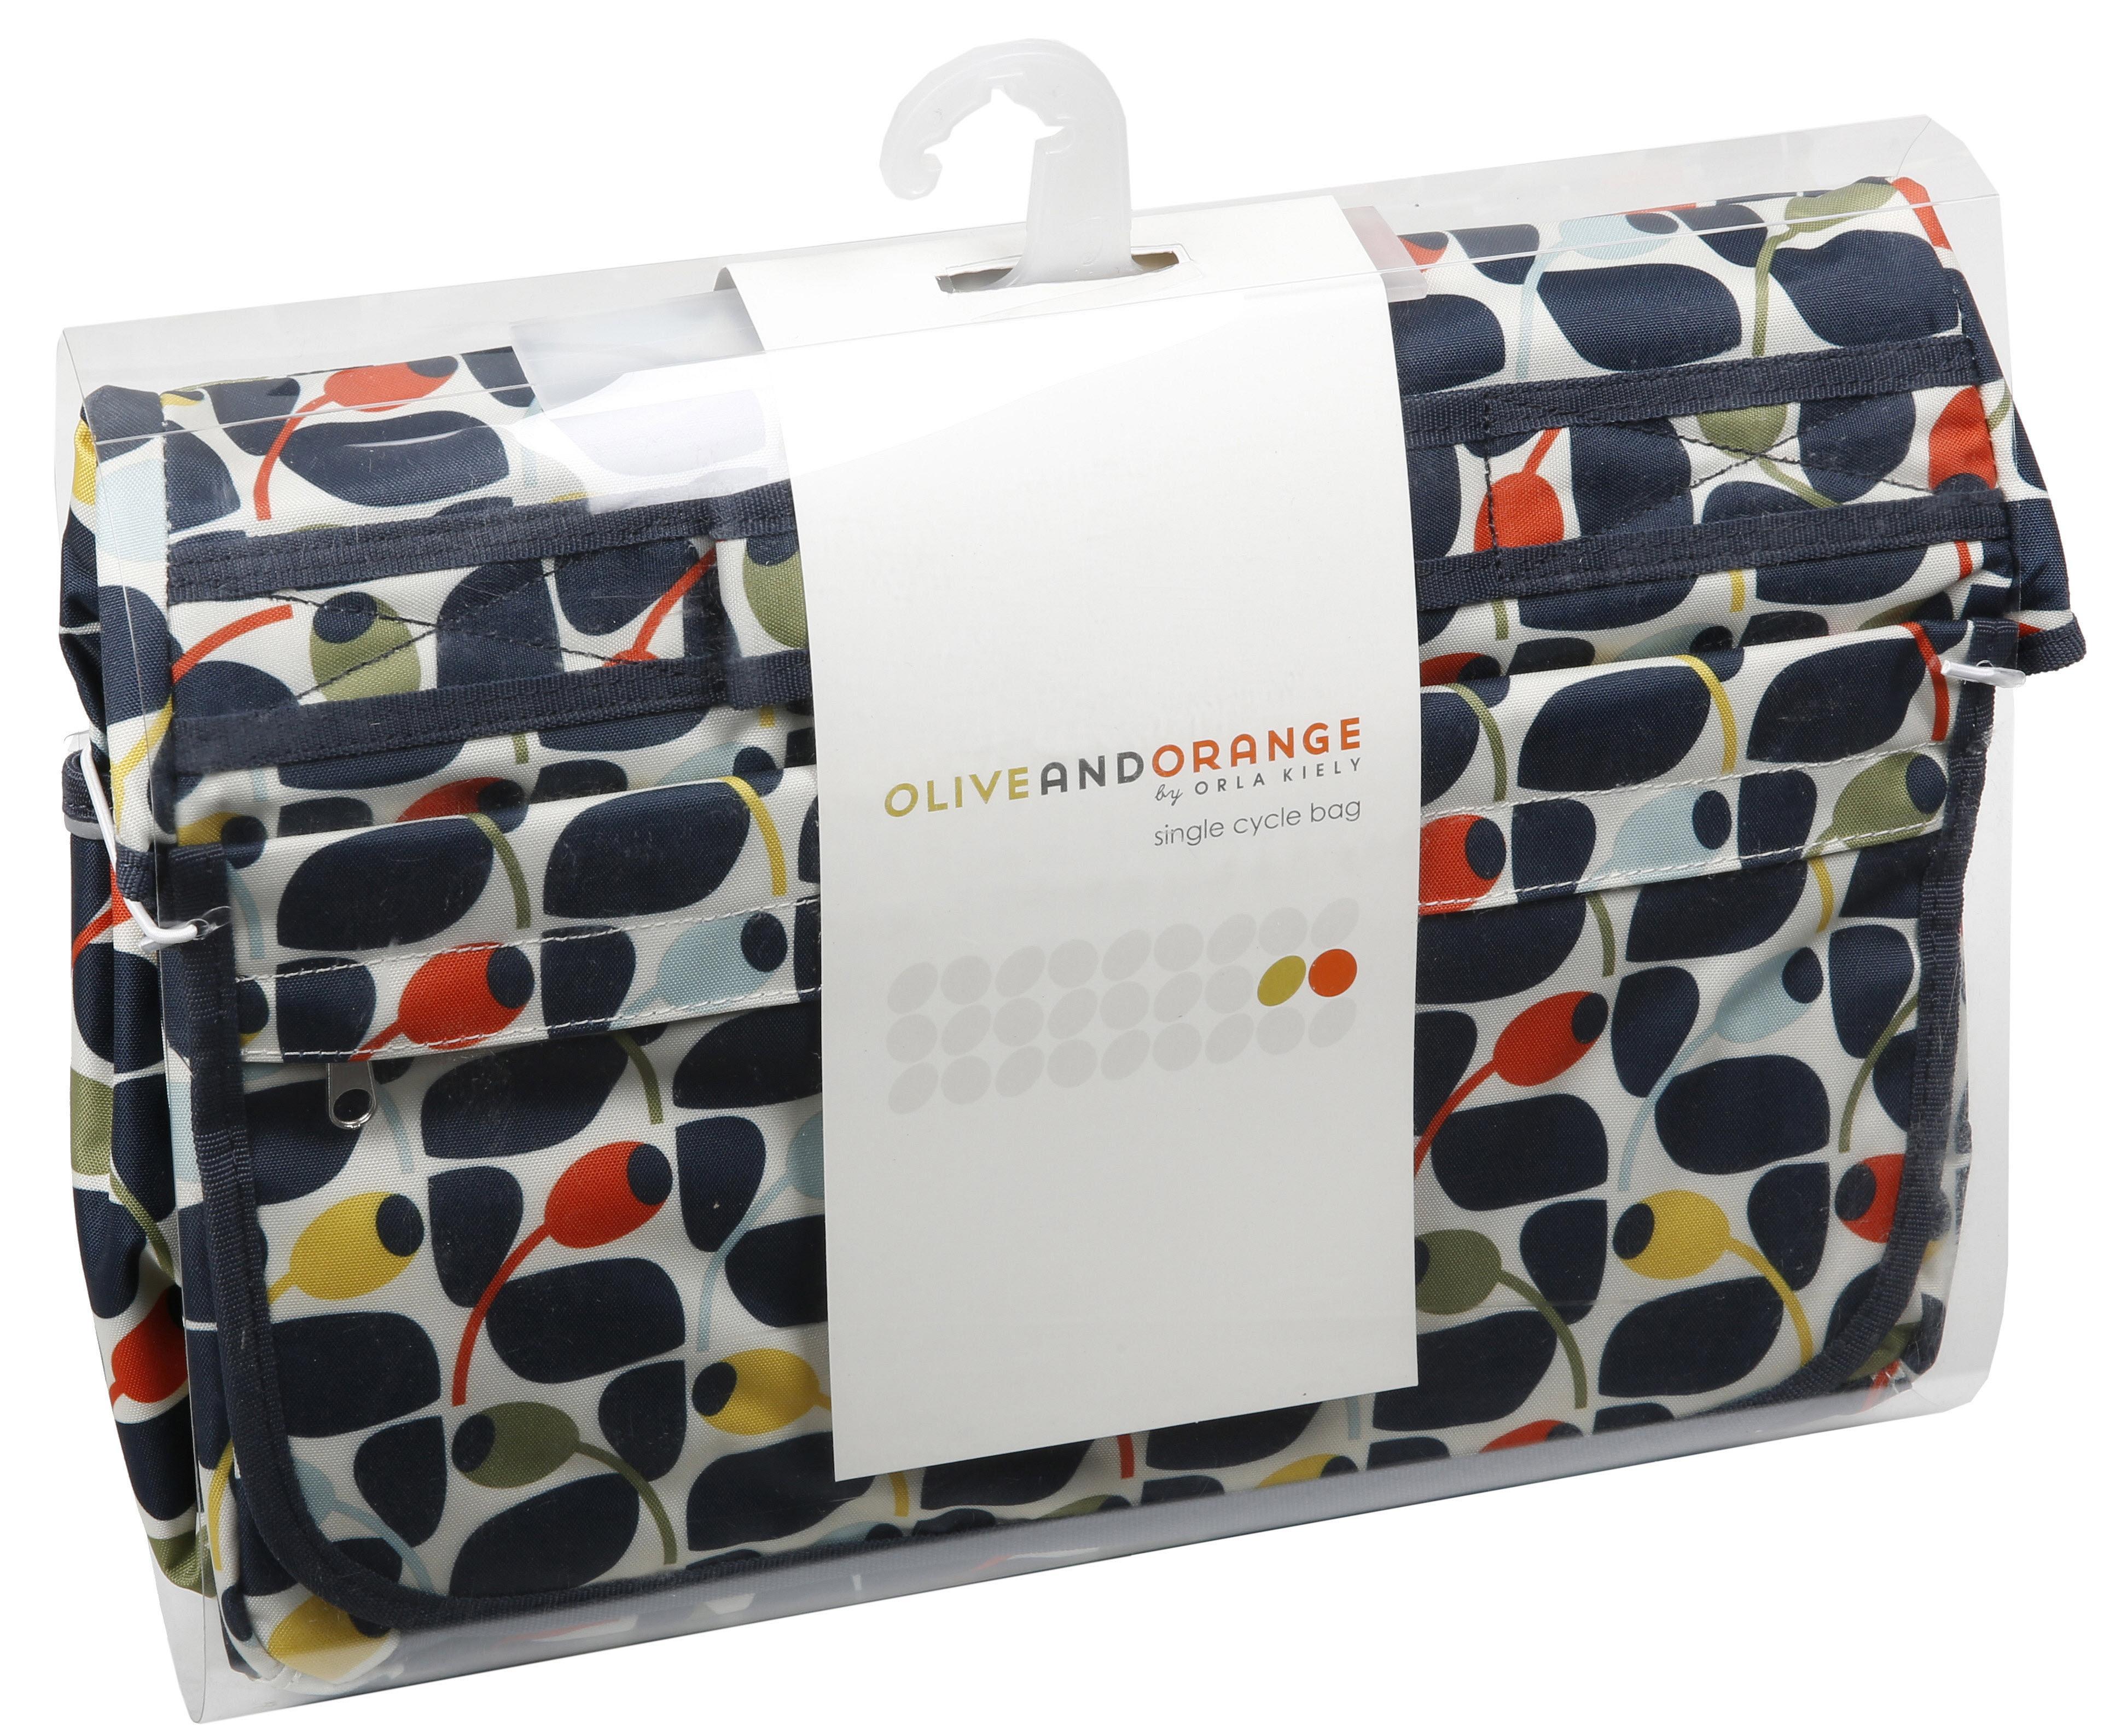 Olive And Orange By Orla Kiely Waterproof Cycling Bike Bicycle Pannier Bag 5054277205526 Ebay